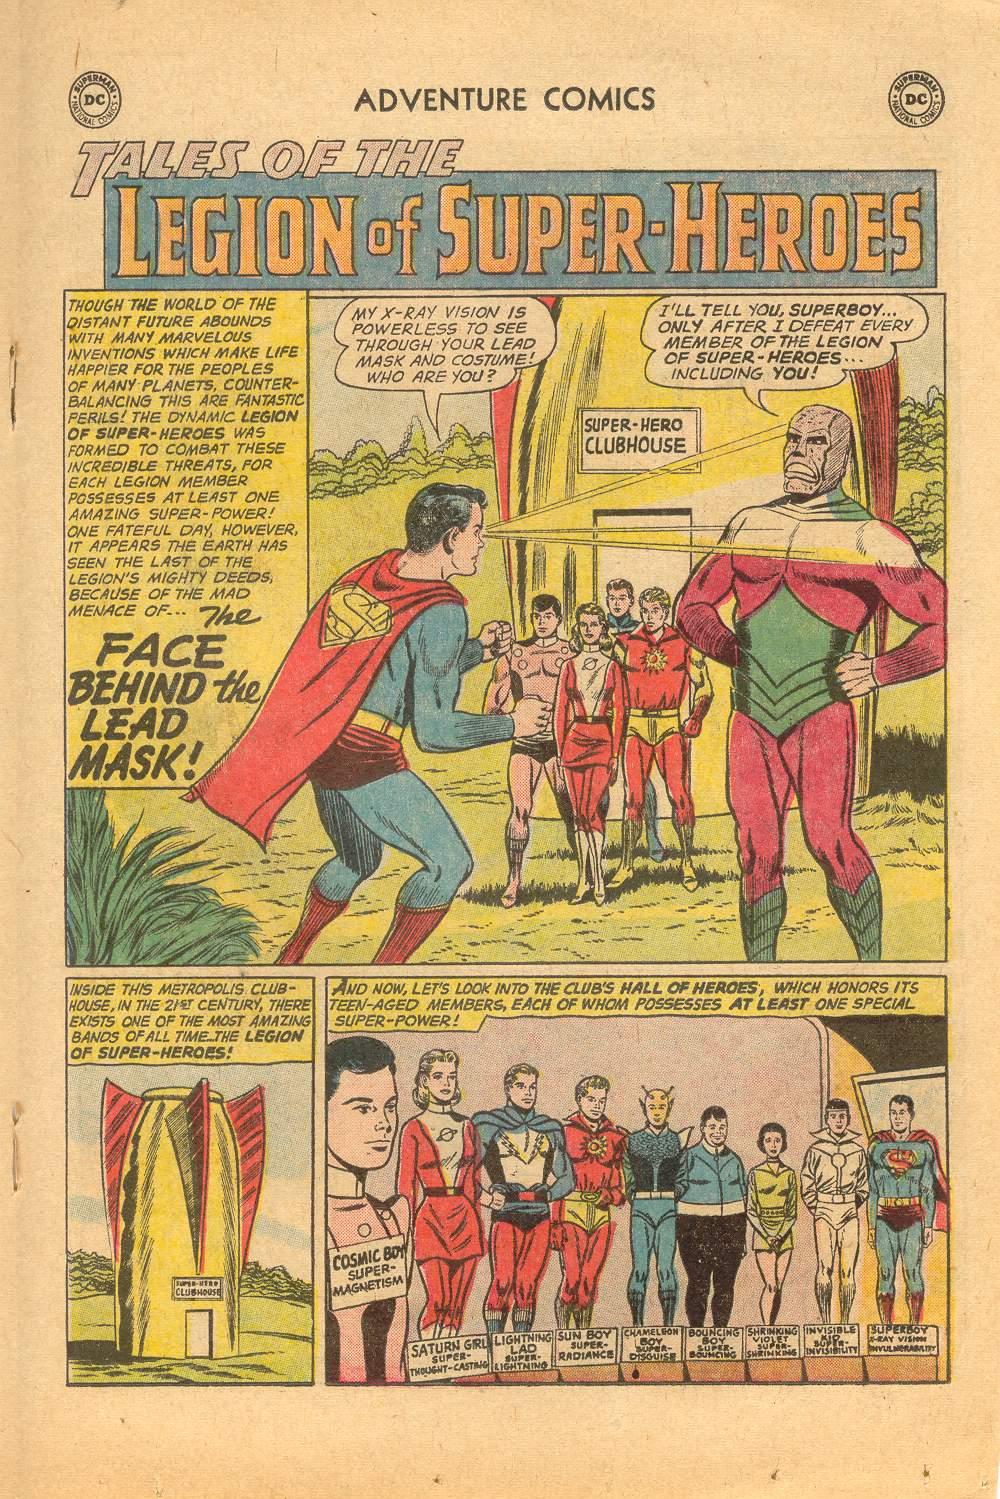 Read online Adventure Comics (1938) comic -  Issue #497 - 63